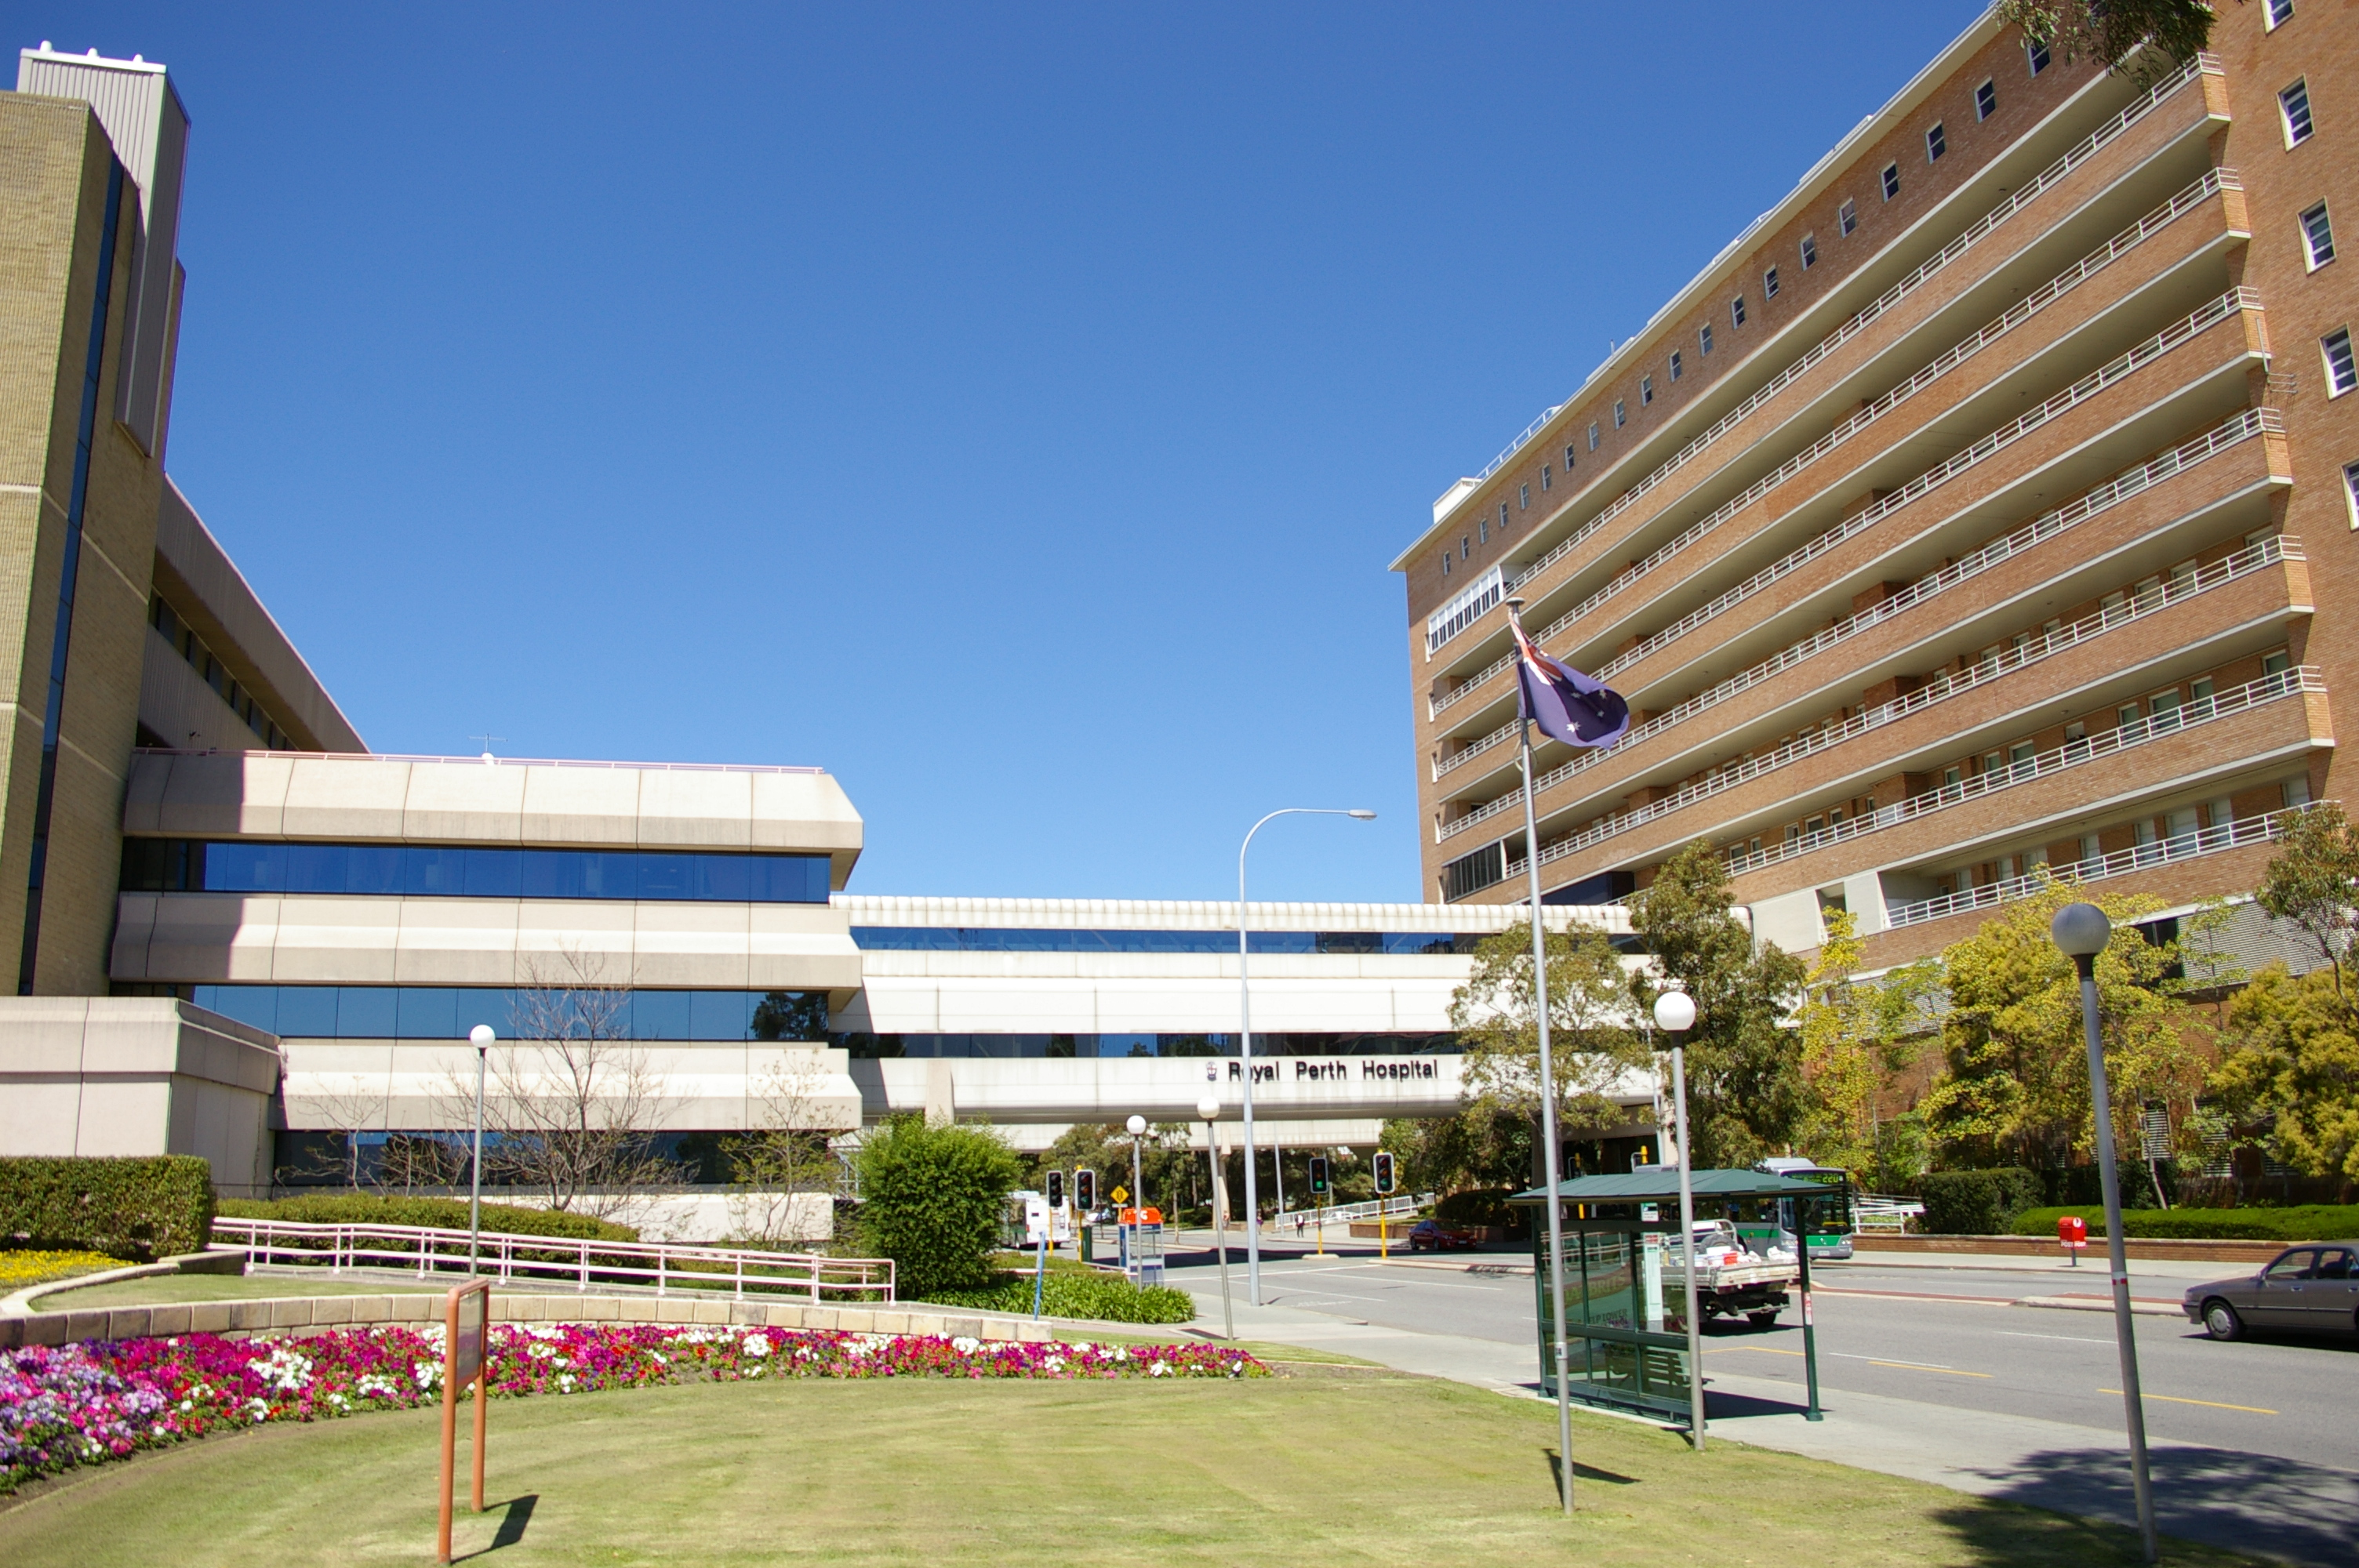 Royal Perth Hospital Wikipedia